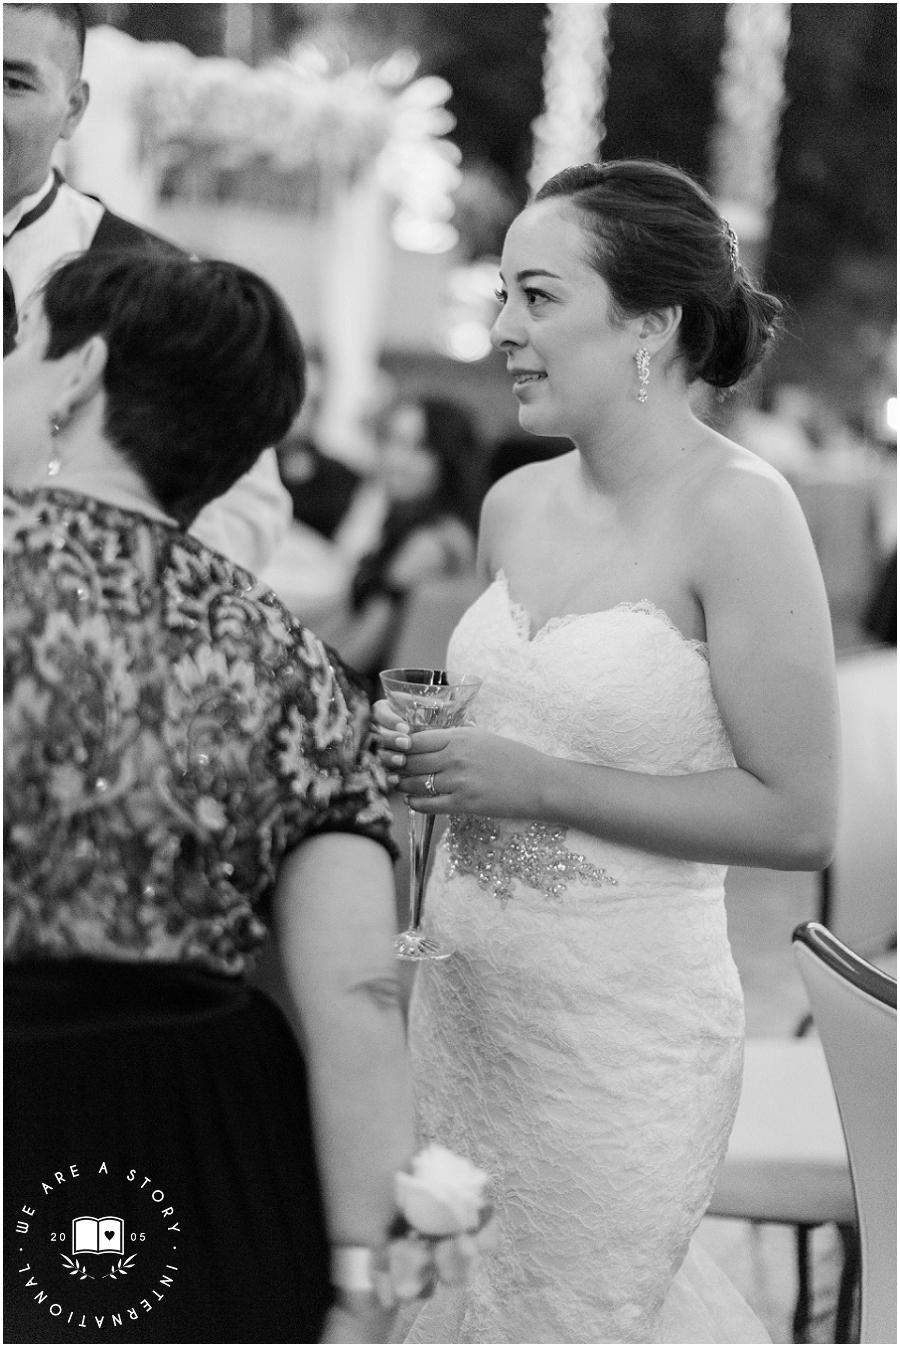 Four Seasons wedding photographer Las Vegas _ We Are A Story wedding photographer_2516.jpg